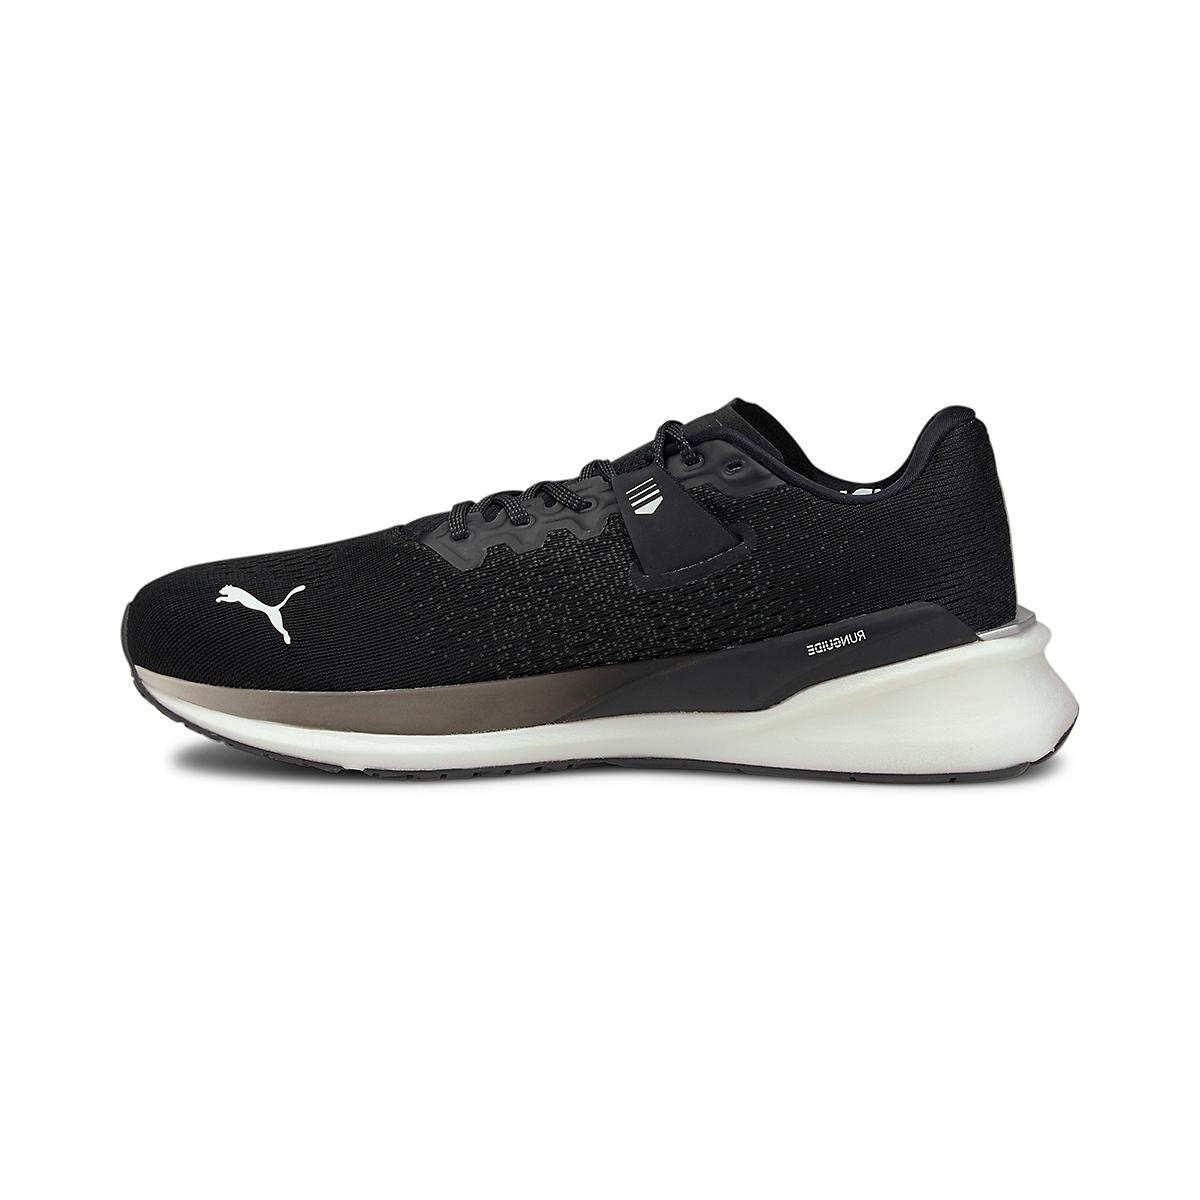 Men's Puma Eternity Nitro Running Shoe - Color: Puma Black - Size: 7 - Width: Regular, Puma Black, large, image 2